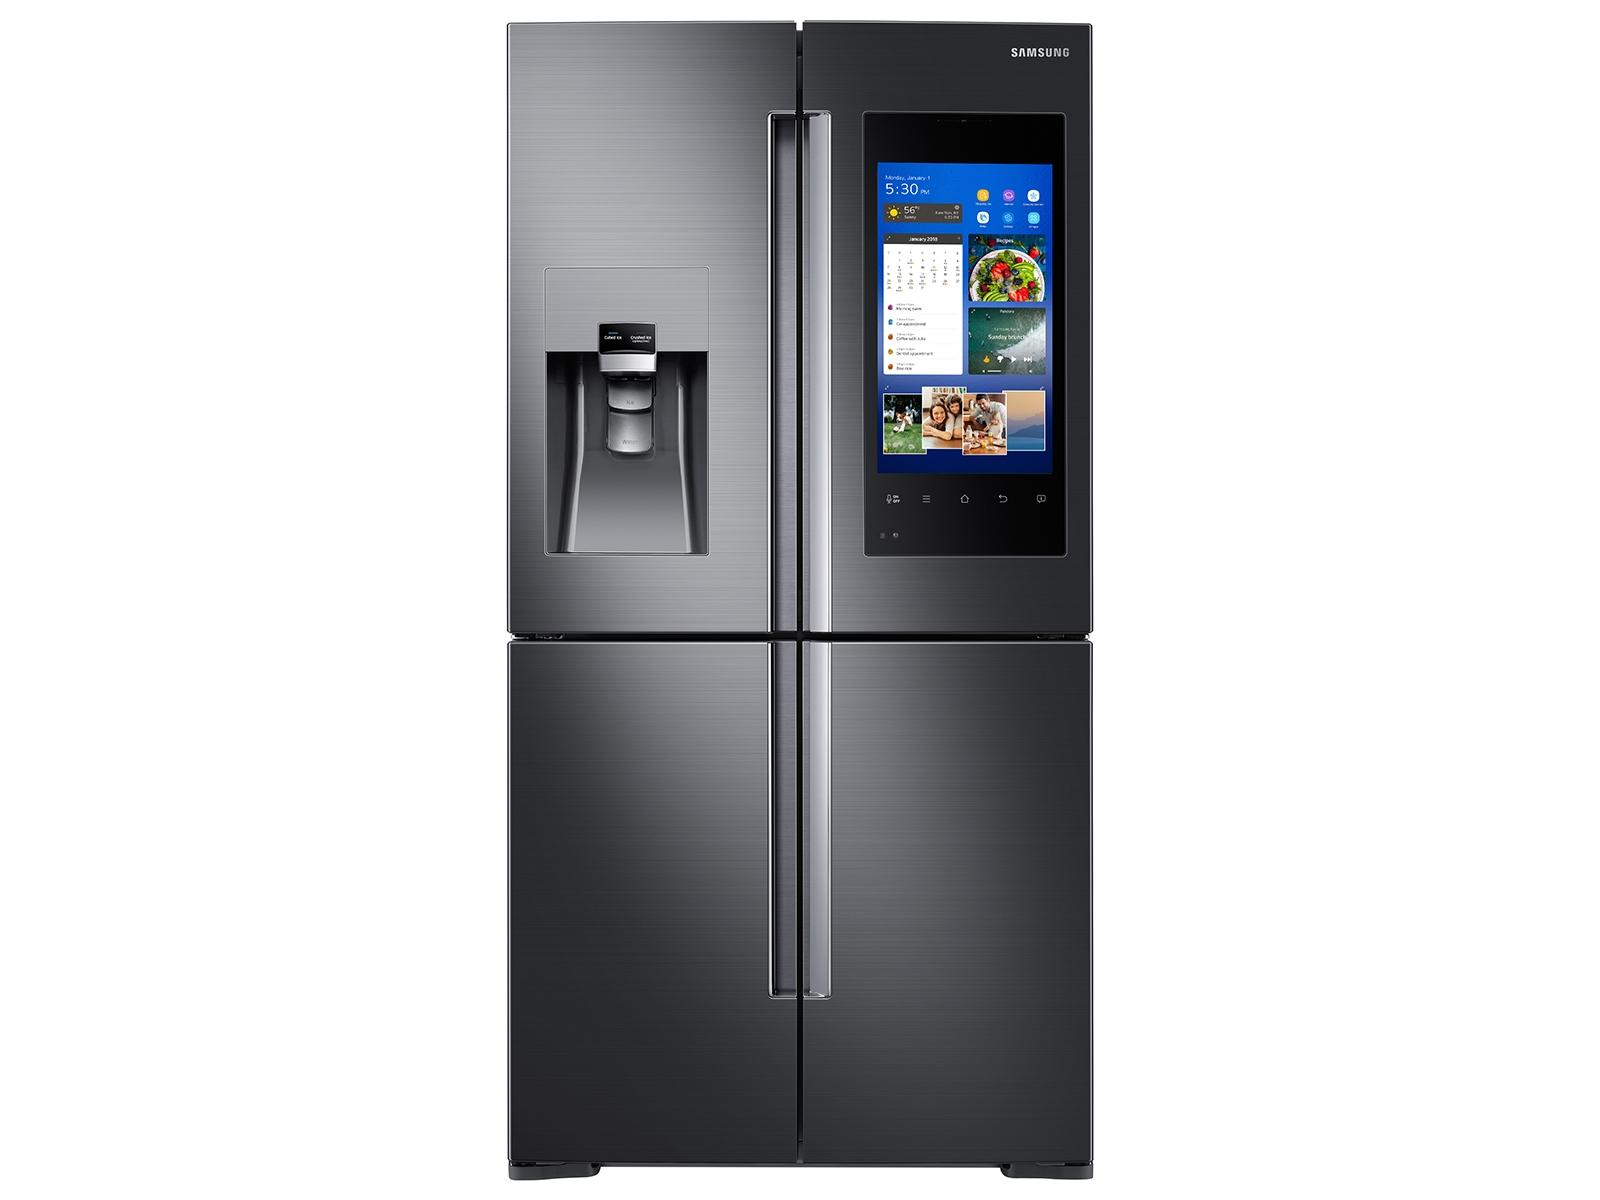 Westpoint Refrigerator Wiring Diagram : Cu ft capacity door flex™ refrigerator with family hub